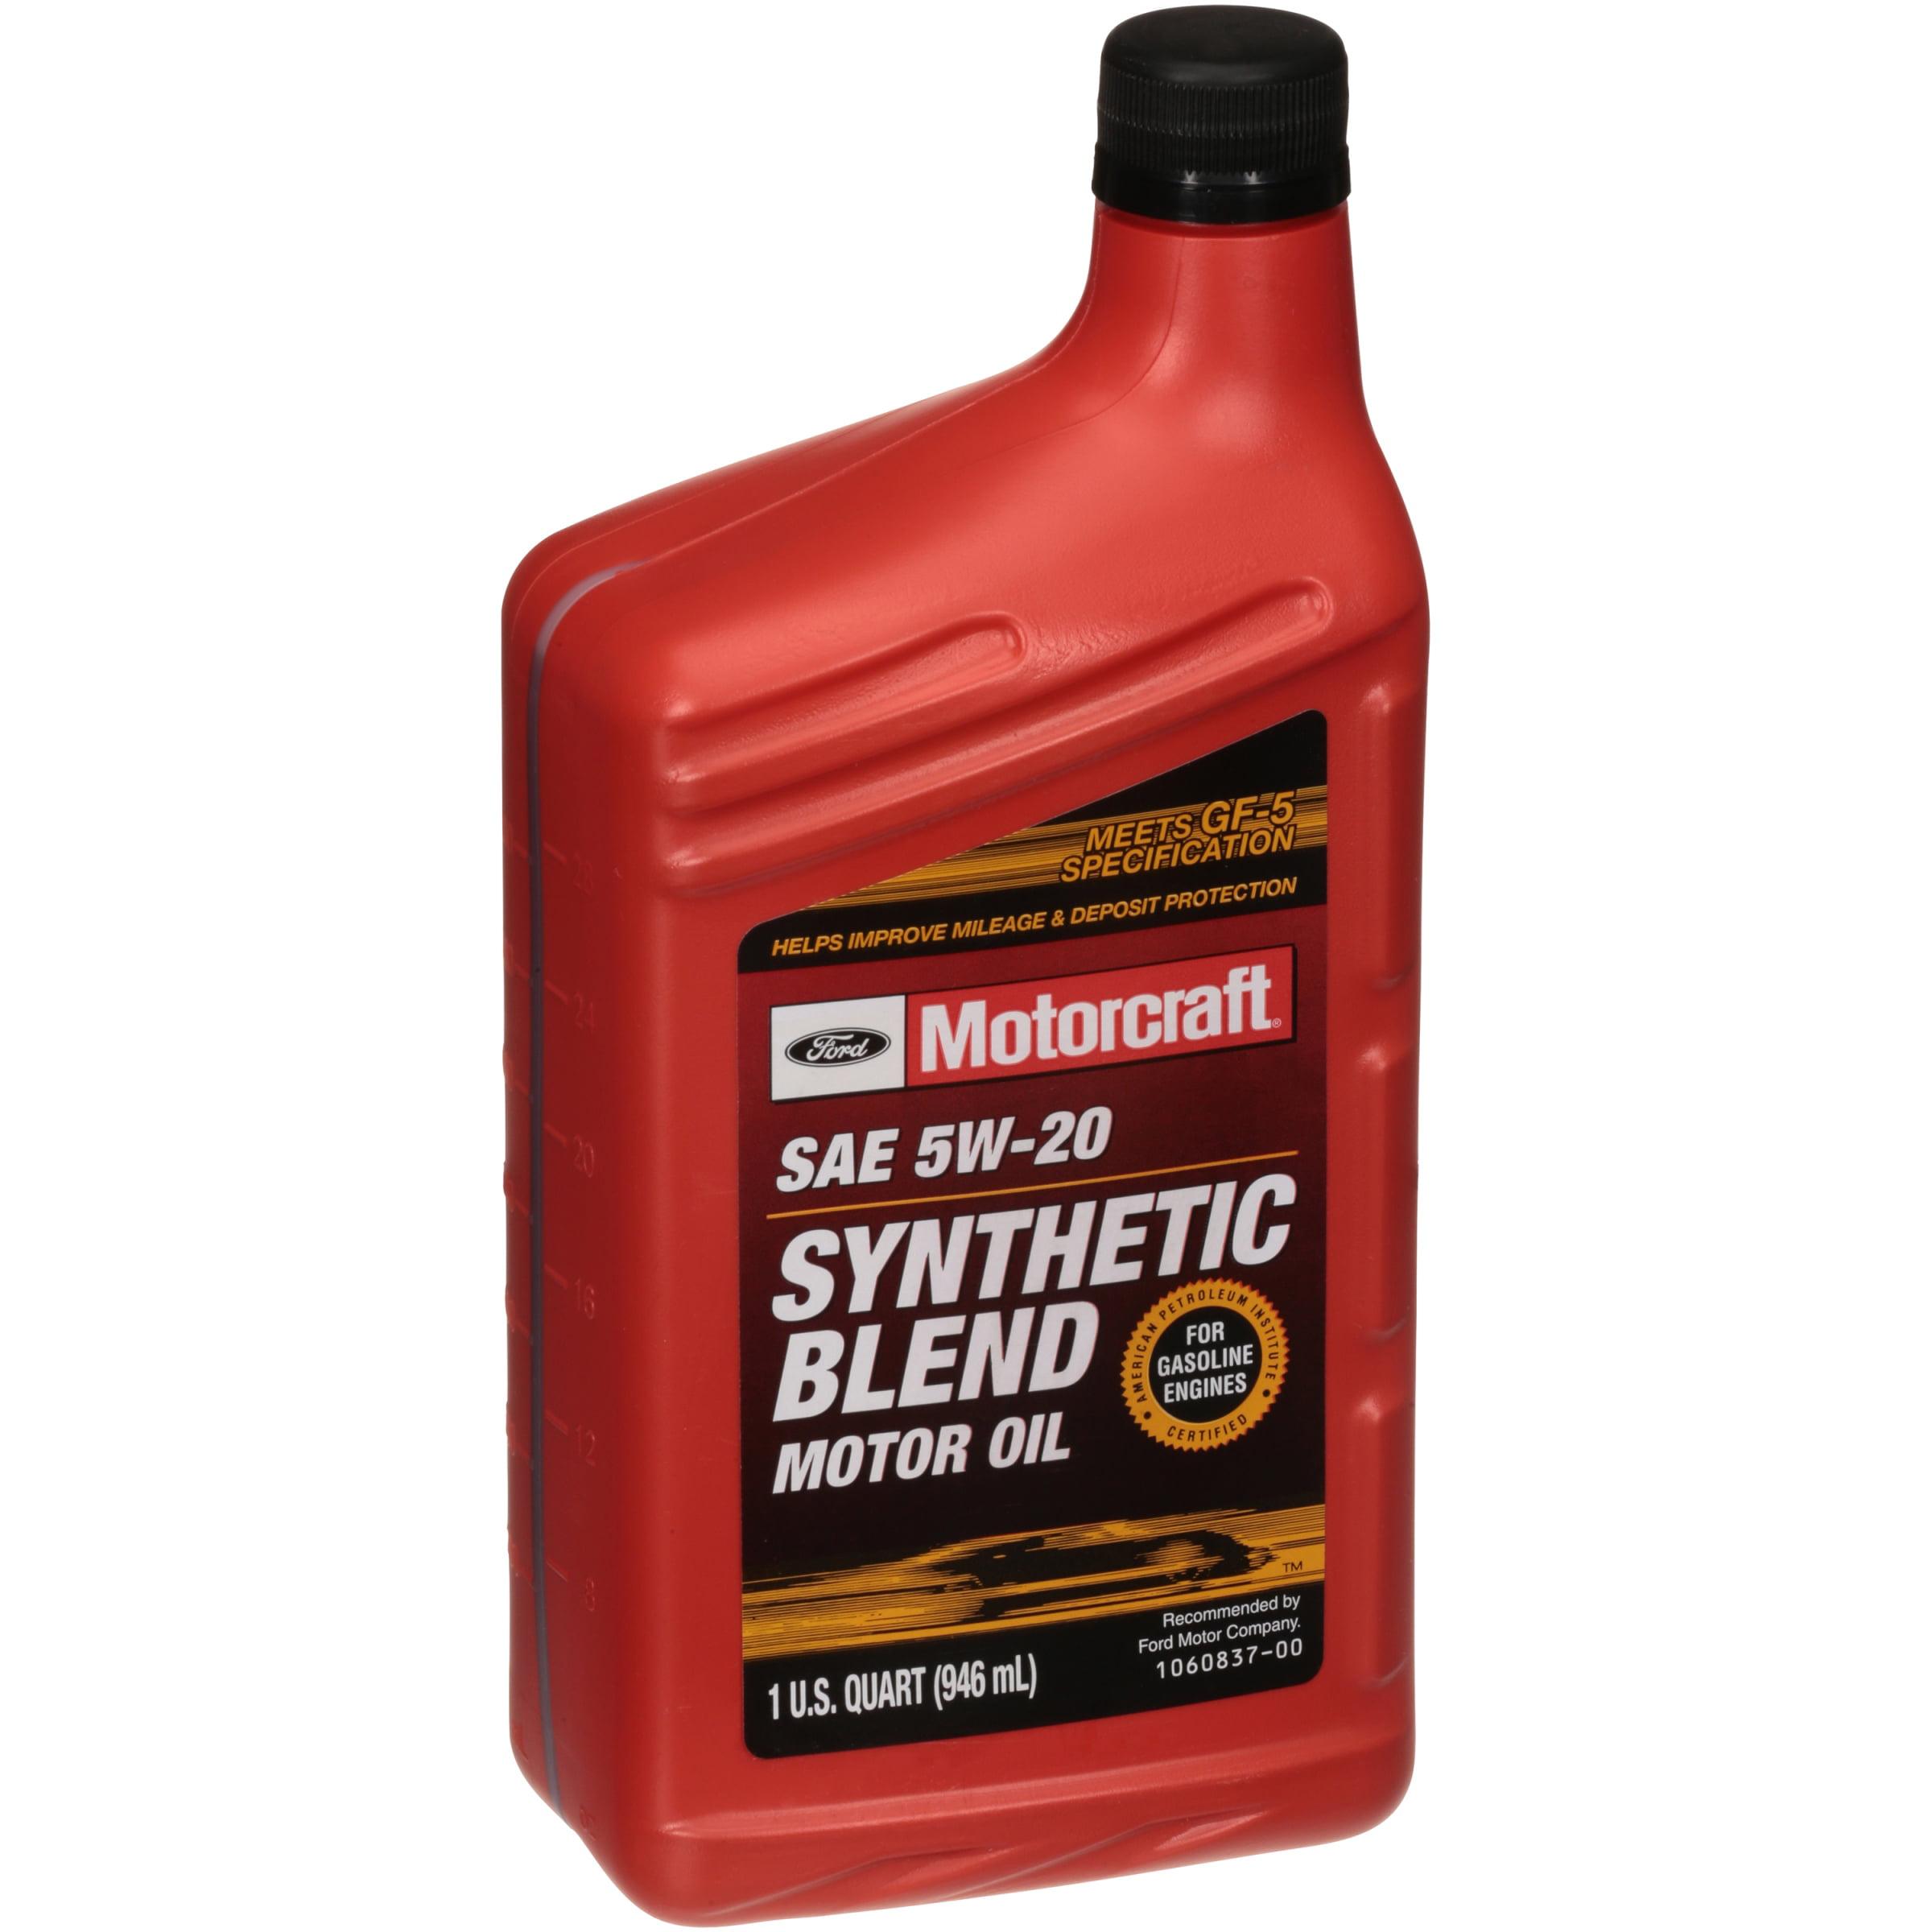 Motorcraft Motor Oil, 5W20, 1-Quart